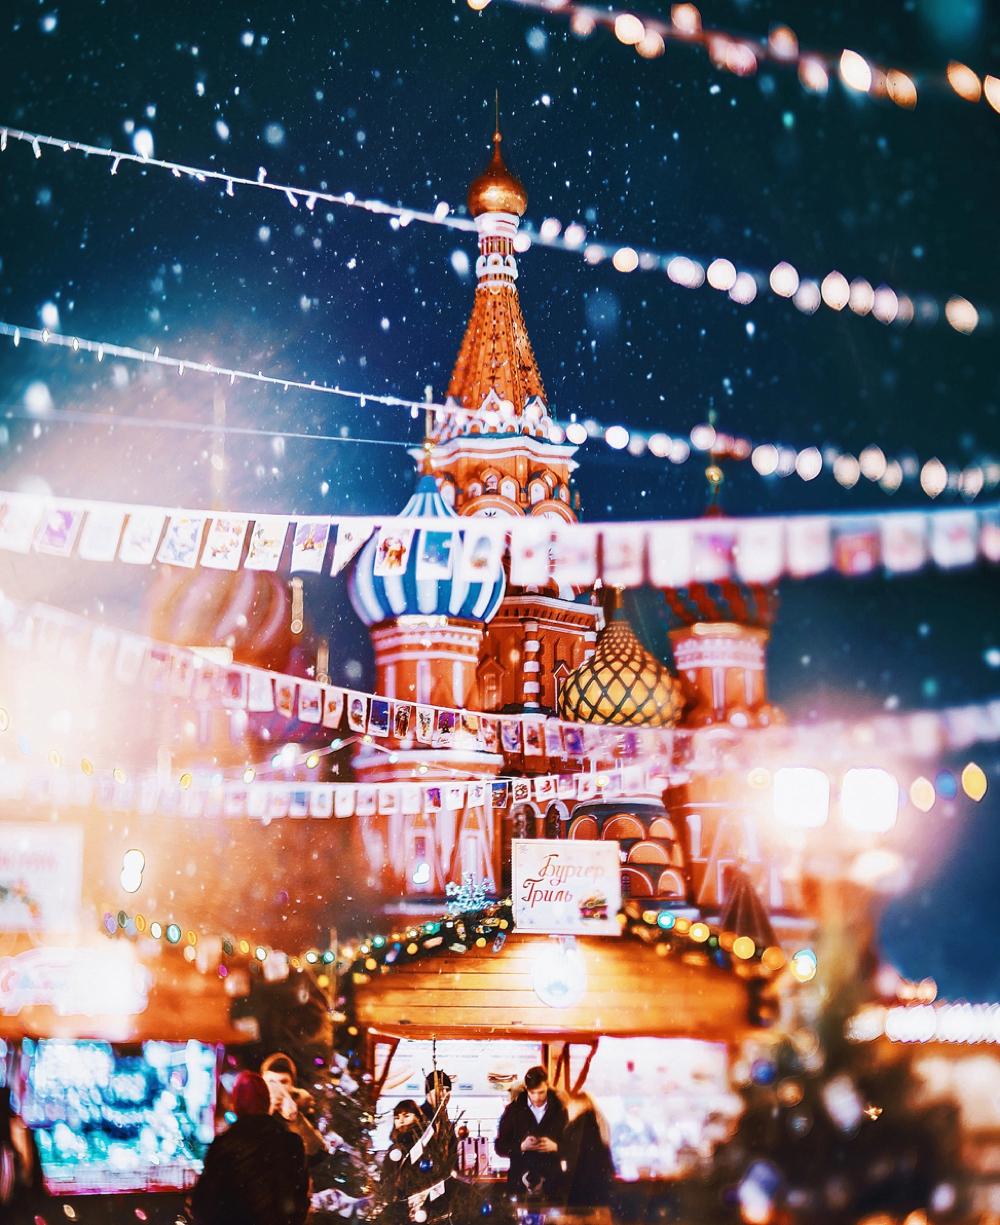 kristina-makeeva-moscow-fairytale-winter_0016